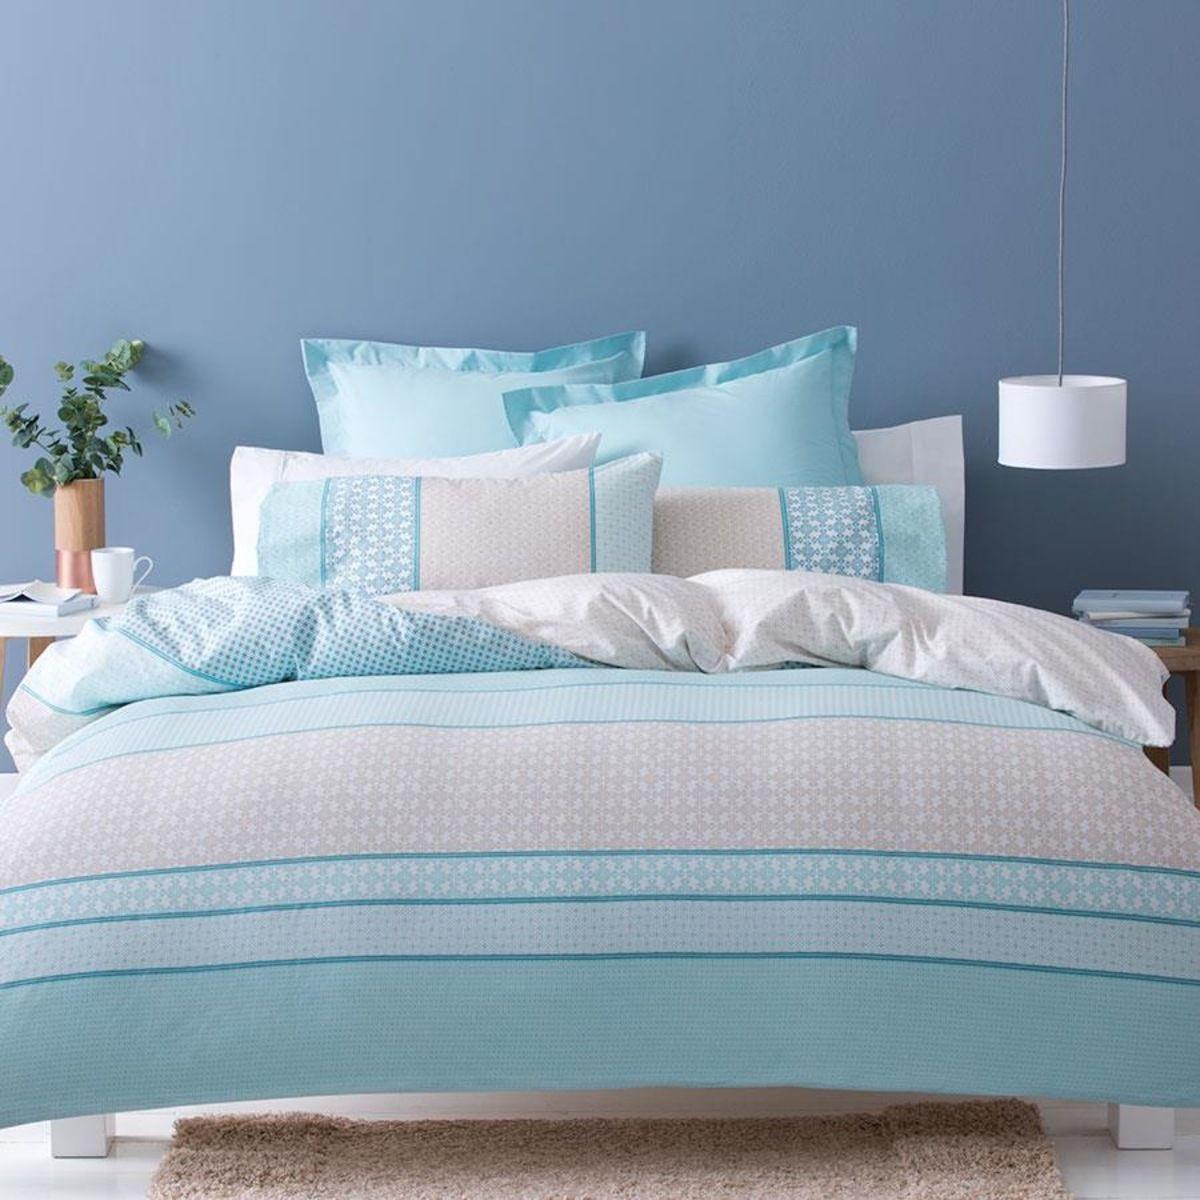 Ava Quilt Cover Set Queen Bed Kmart Quilt Cover Sets Mattress Bedroom Bedroom Set